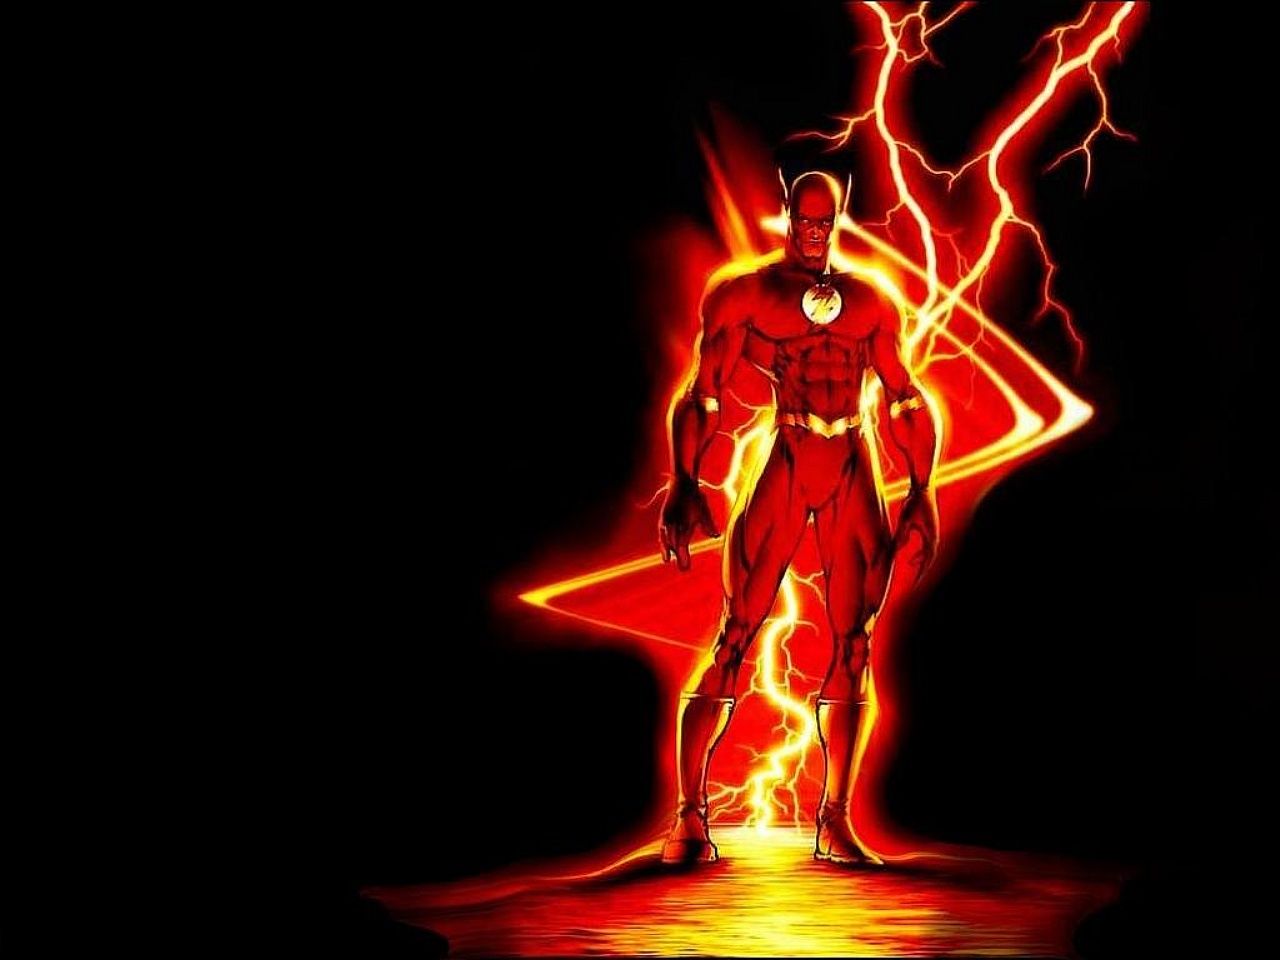 The Flash 2   Comics Photography Desktop Wallpapers 22826 Views 1280x960